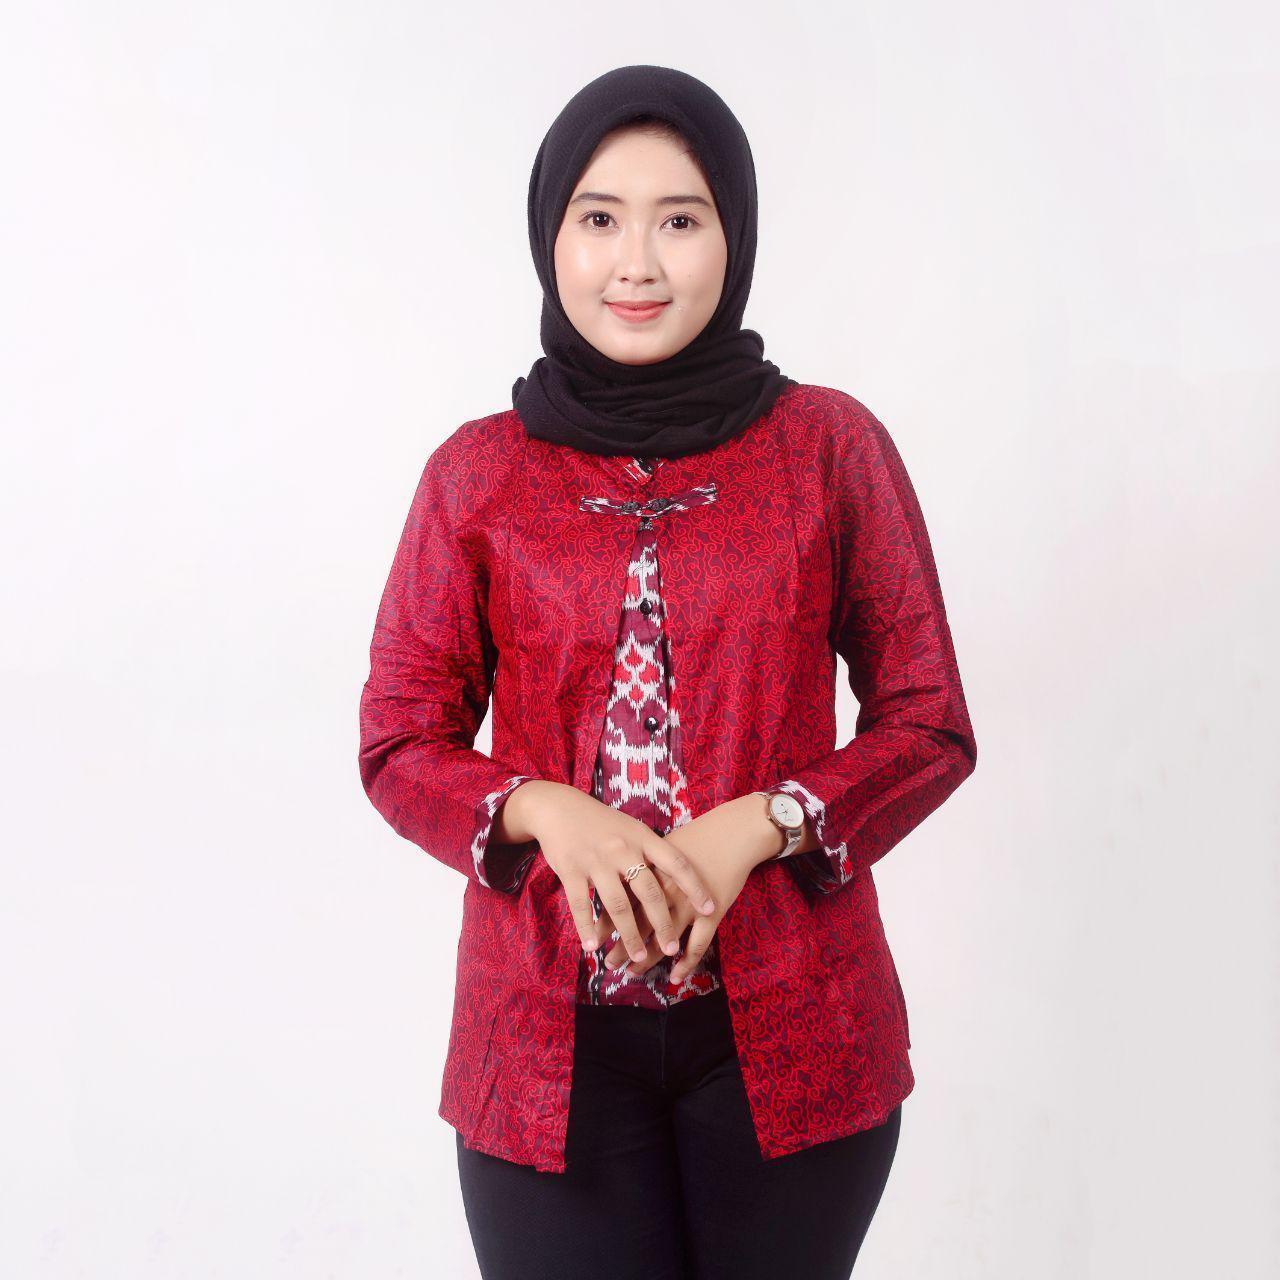 Batik Blouse Batik Blus Batik Baju Batik Batik Kerja Baju Batik Wanita Baju Atasan Wanita Baju Batik Atasan Model Baju Batik Baju